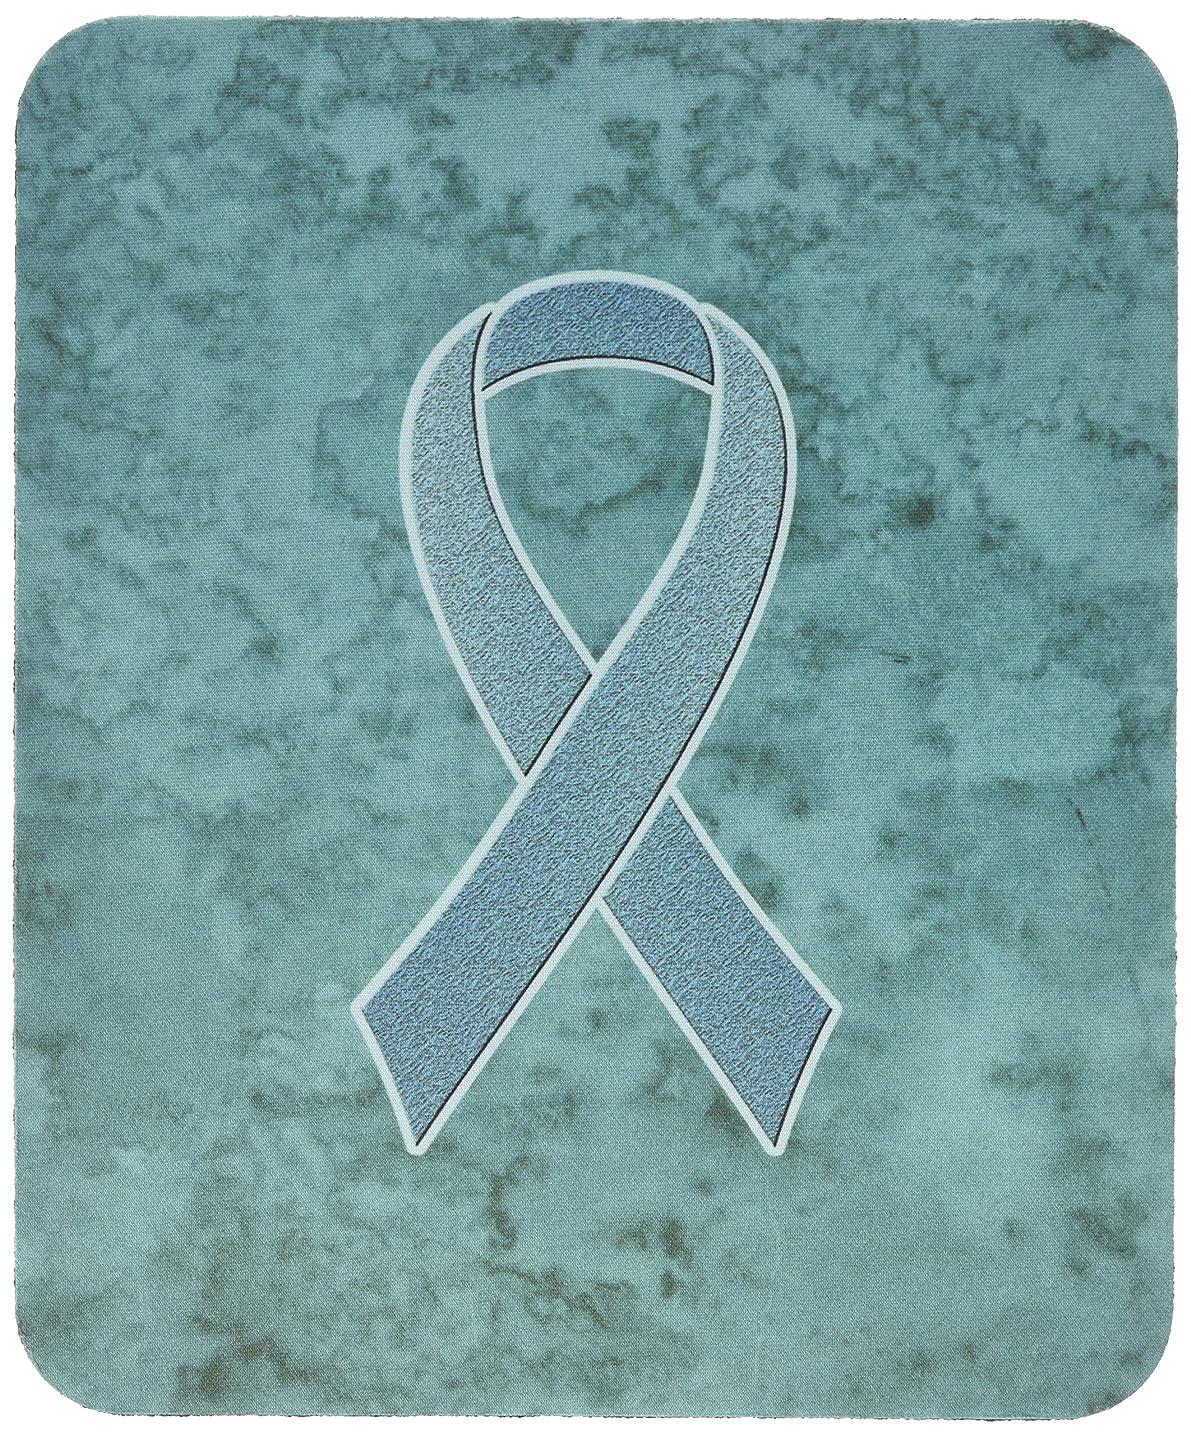 Caroline's Treasures Teal Ribbon for Ovarian Cancer Awareness Mouse Pad/Hot Pad/Trivet (AN1201MP)